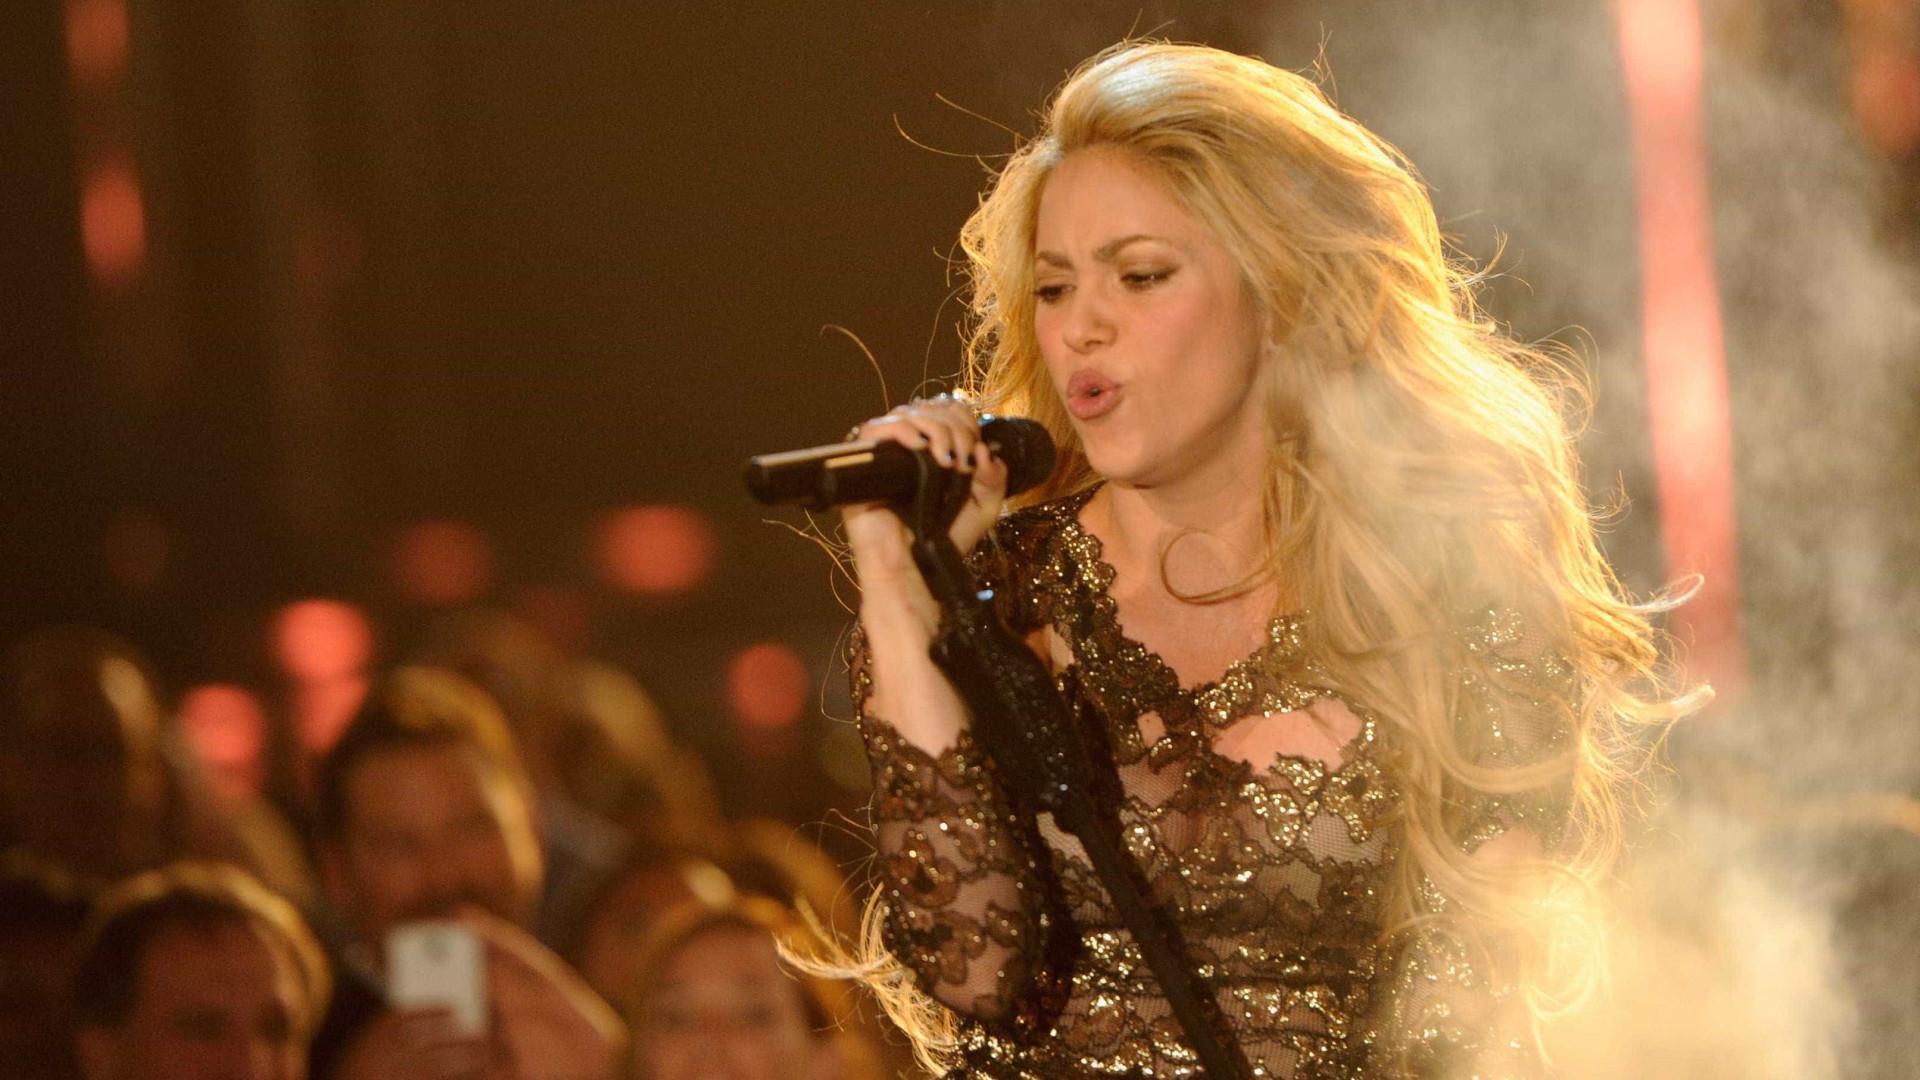 Shakira anuncia retorno aos palcos após hemorragia